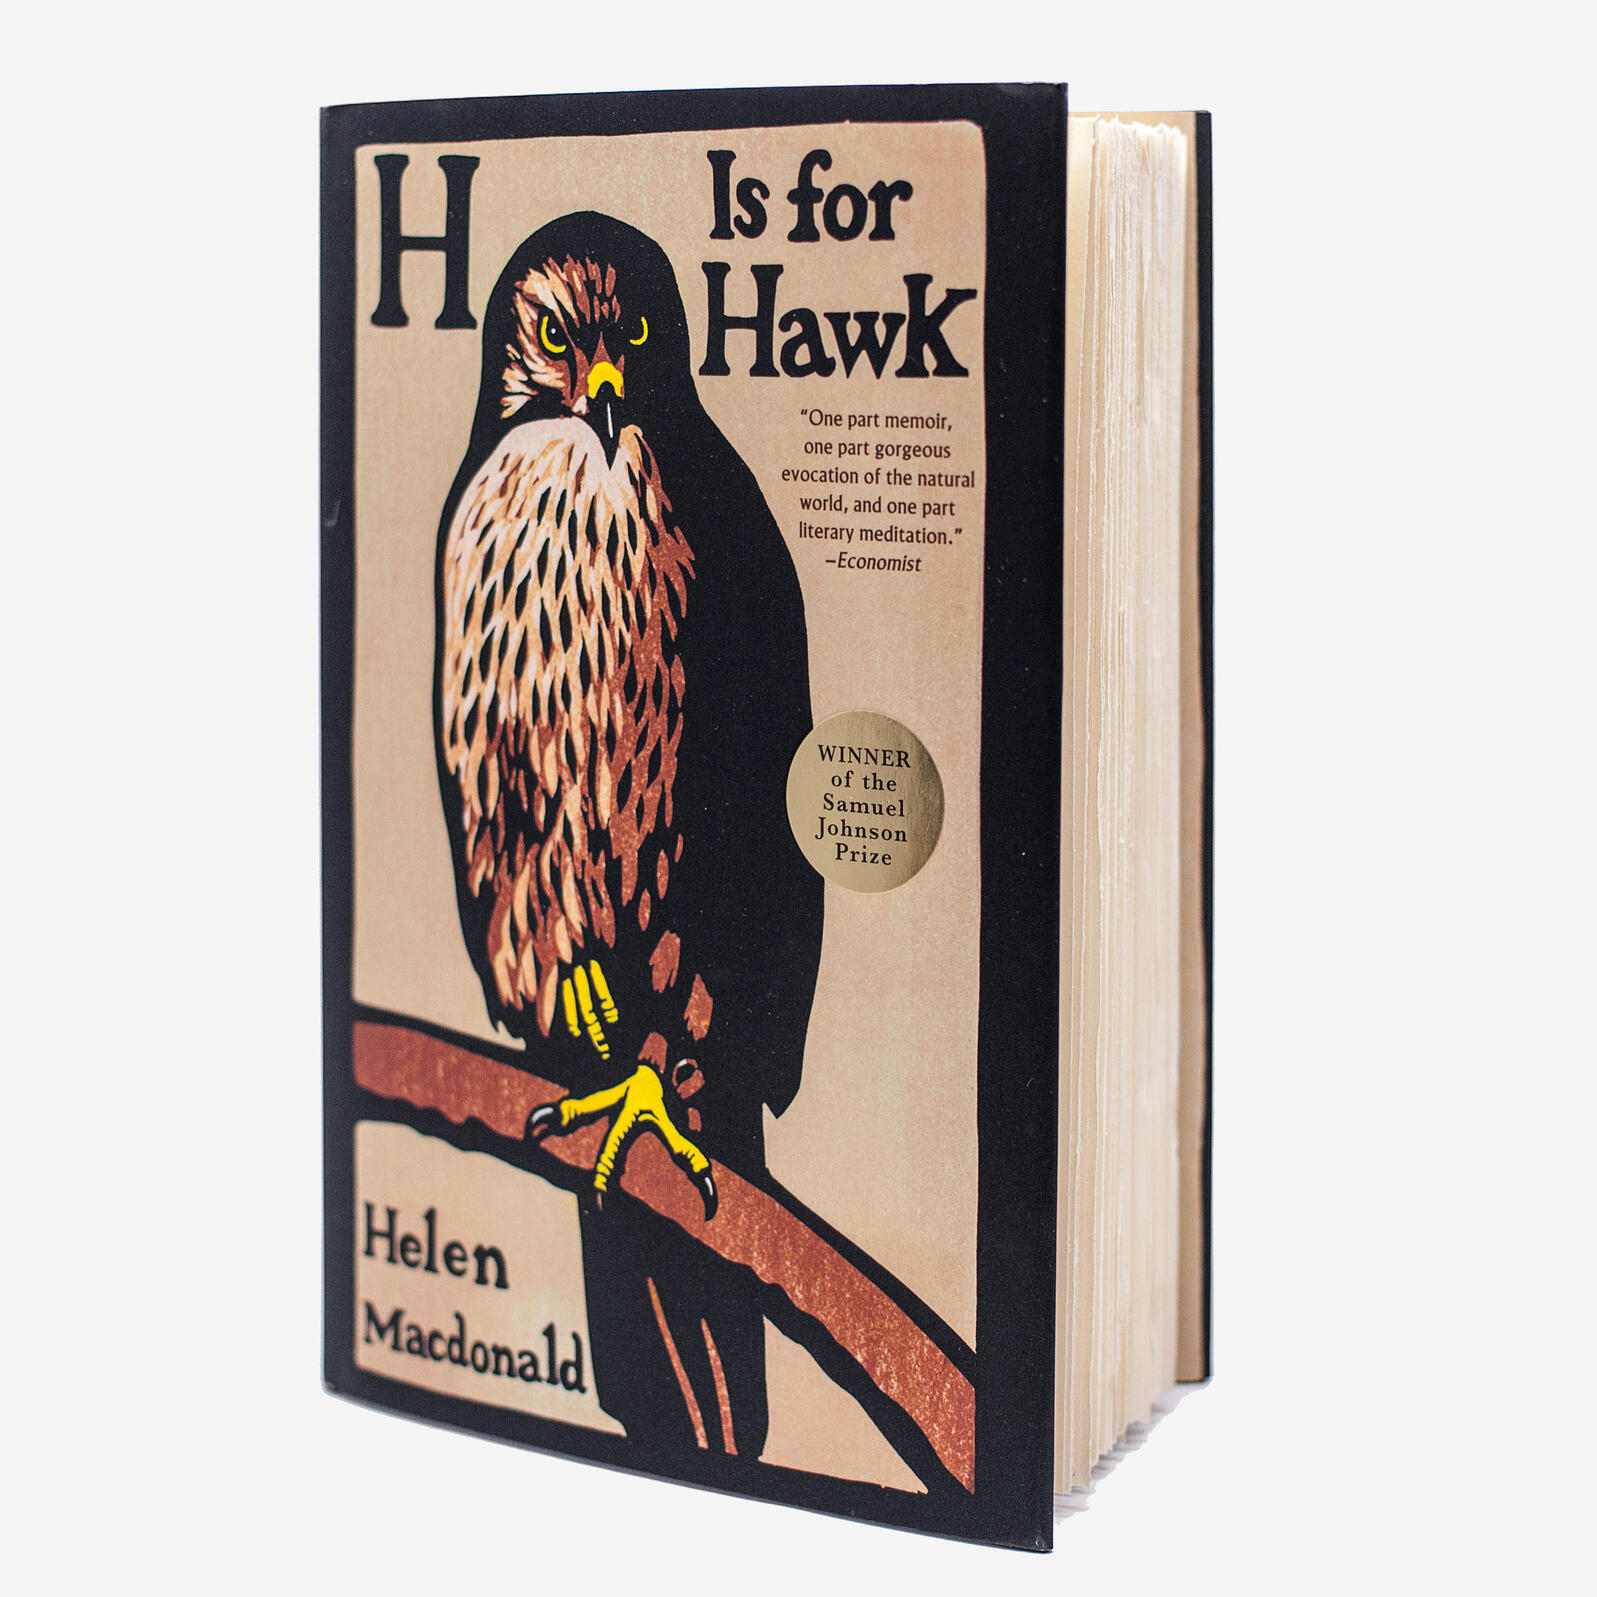 H is for Hawk by Helen Macdonald (Grove Press). Camilla Cerea/National Audubon Society